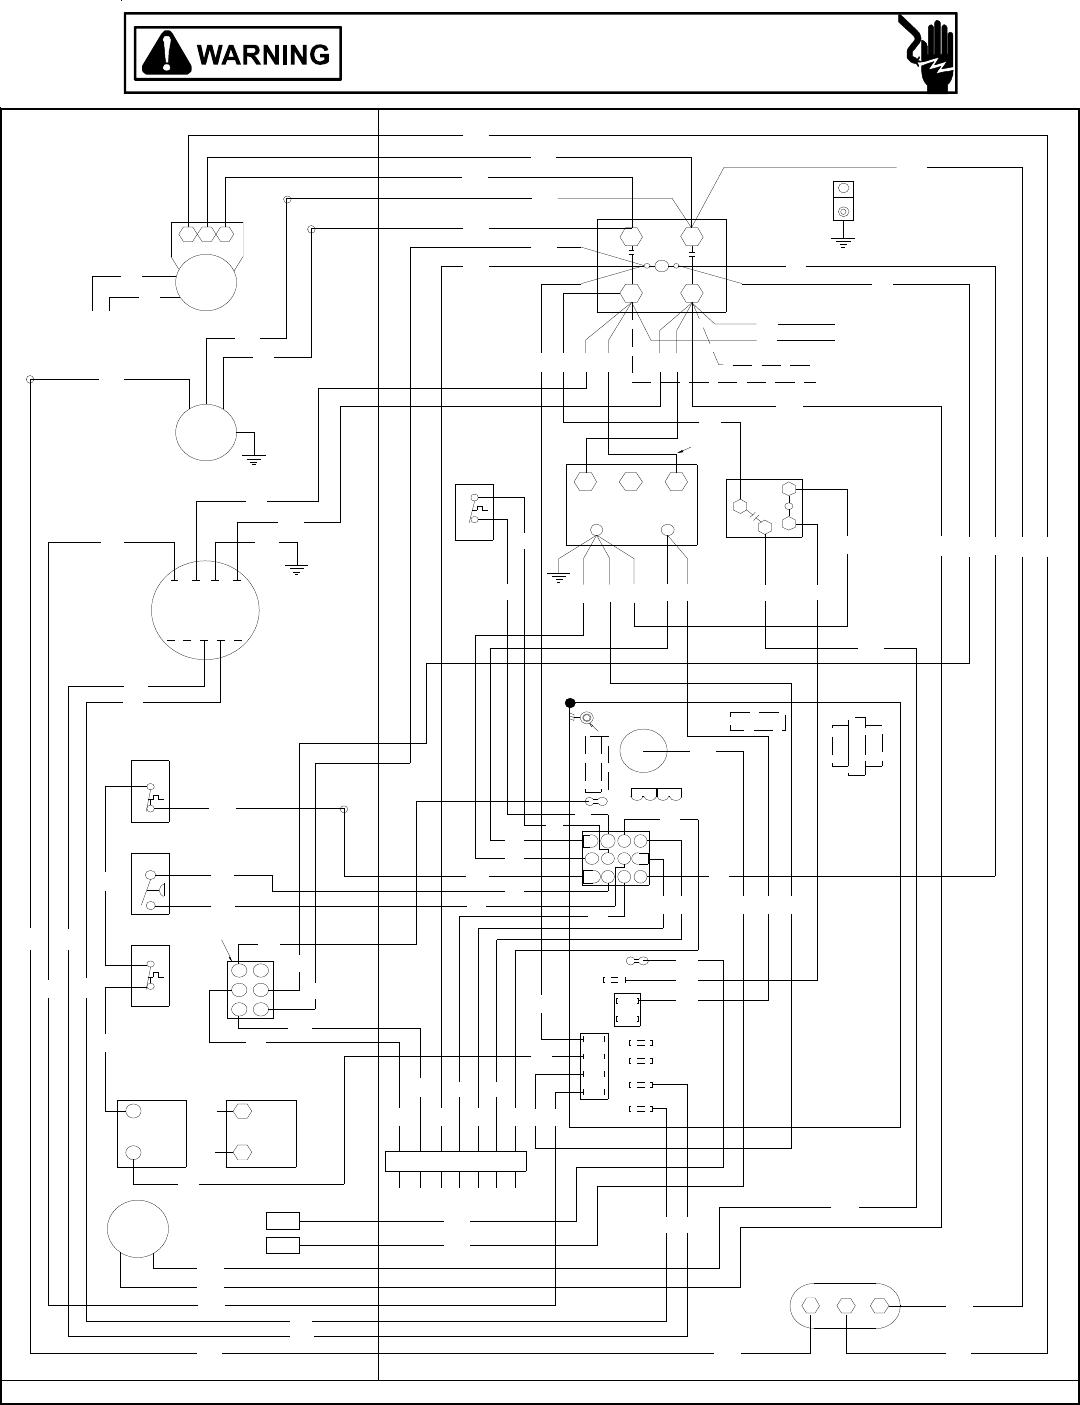 [SCHEMATICS_4HG]  Goodman Mfg Gpg13 Users Manual | Wiring Diagram Goodman Manufacturing Company |  | UserManual.wiki